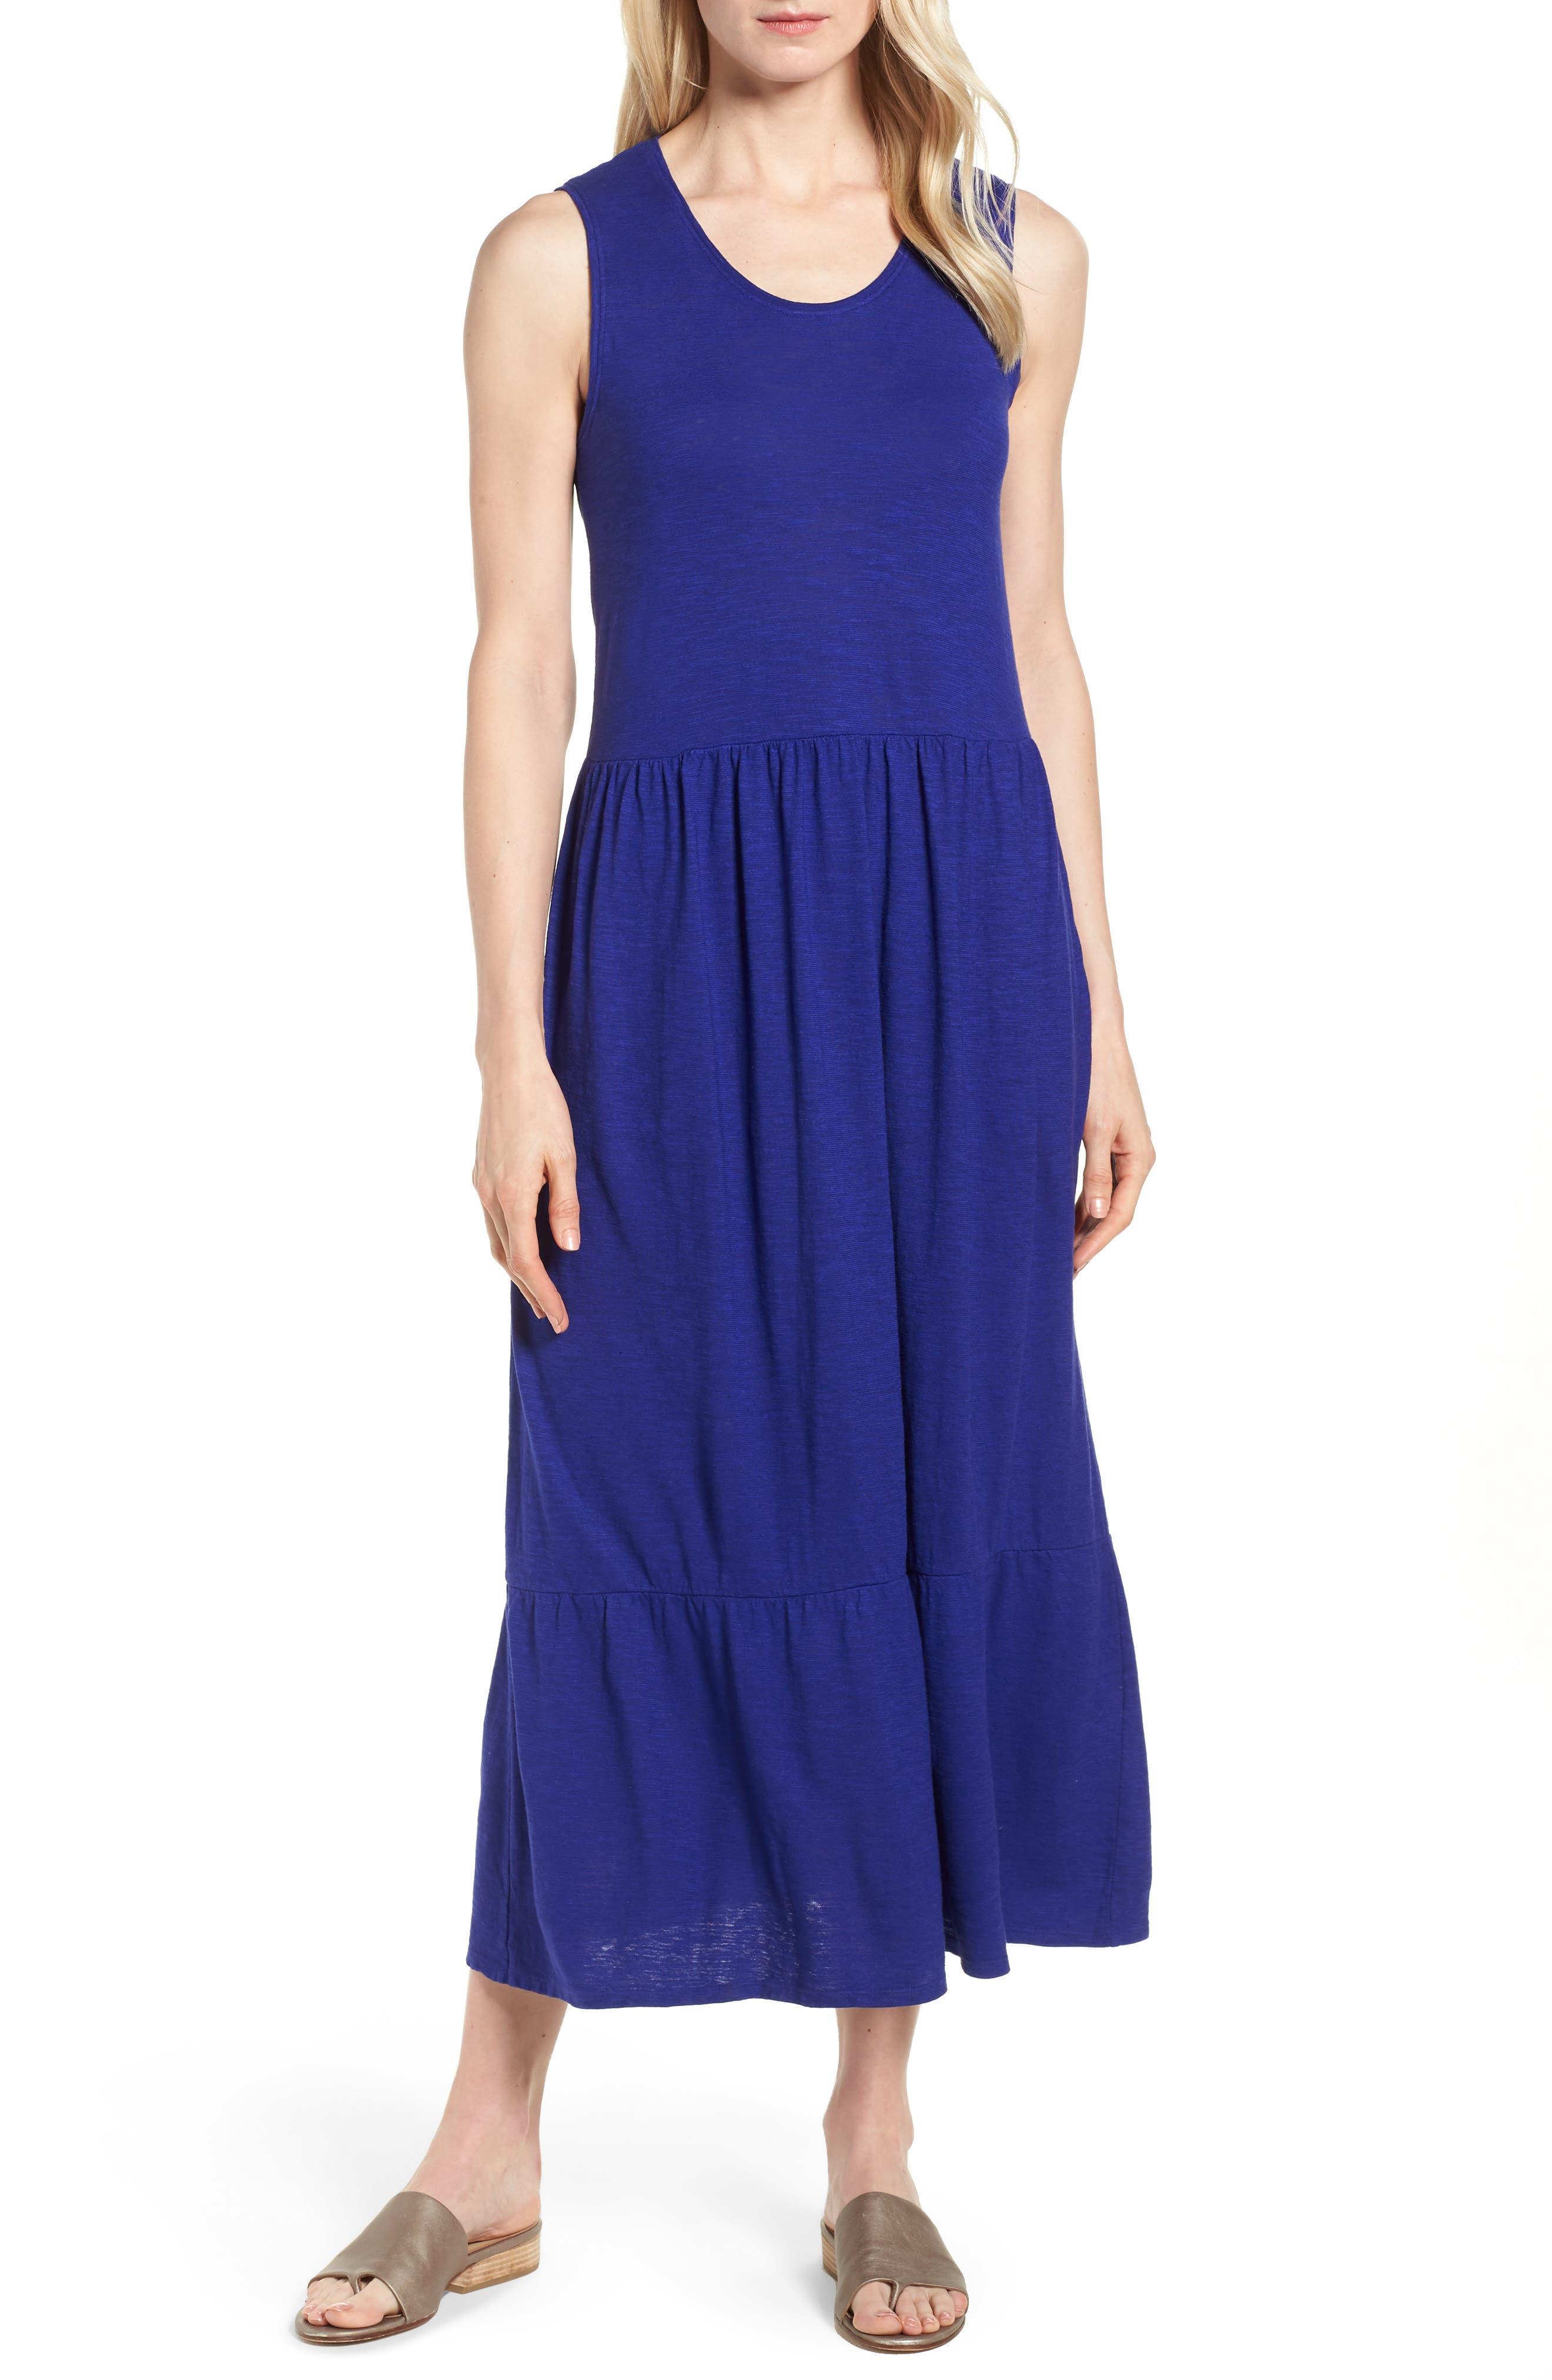 Scooped Neck Hemp & Cotton Midi Dress,                             Main thumbnail 1, color,                             Blue Violet